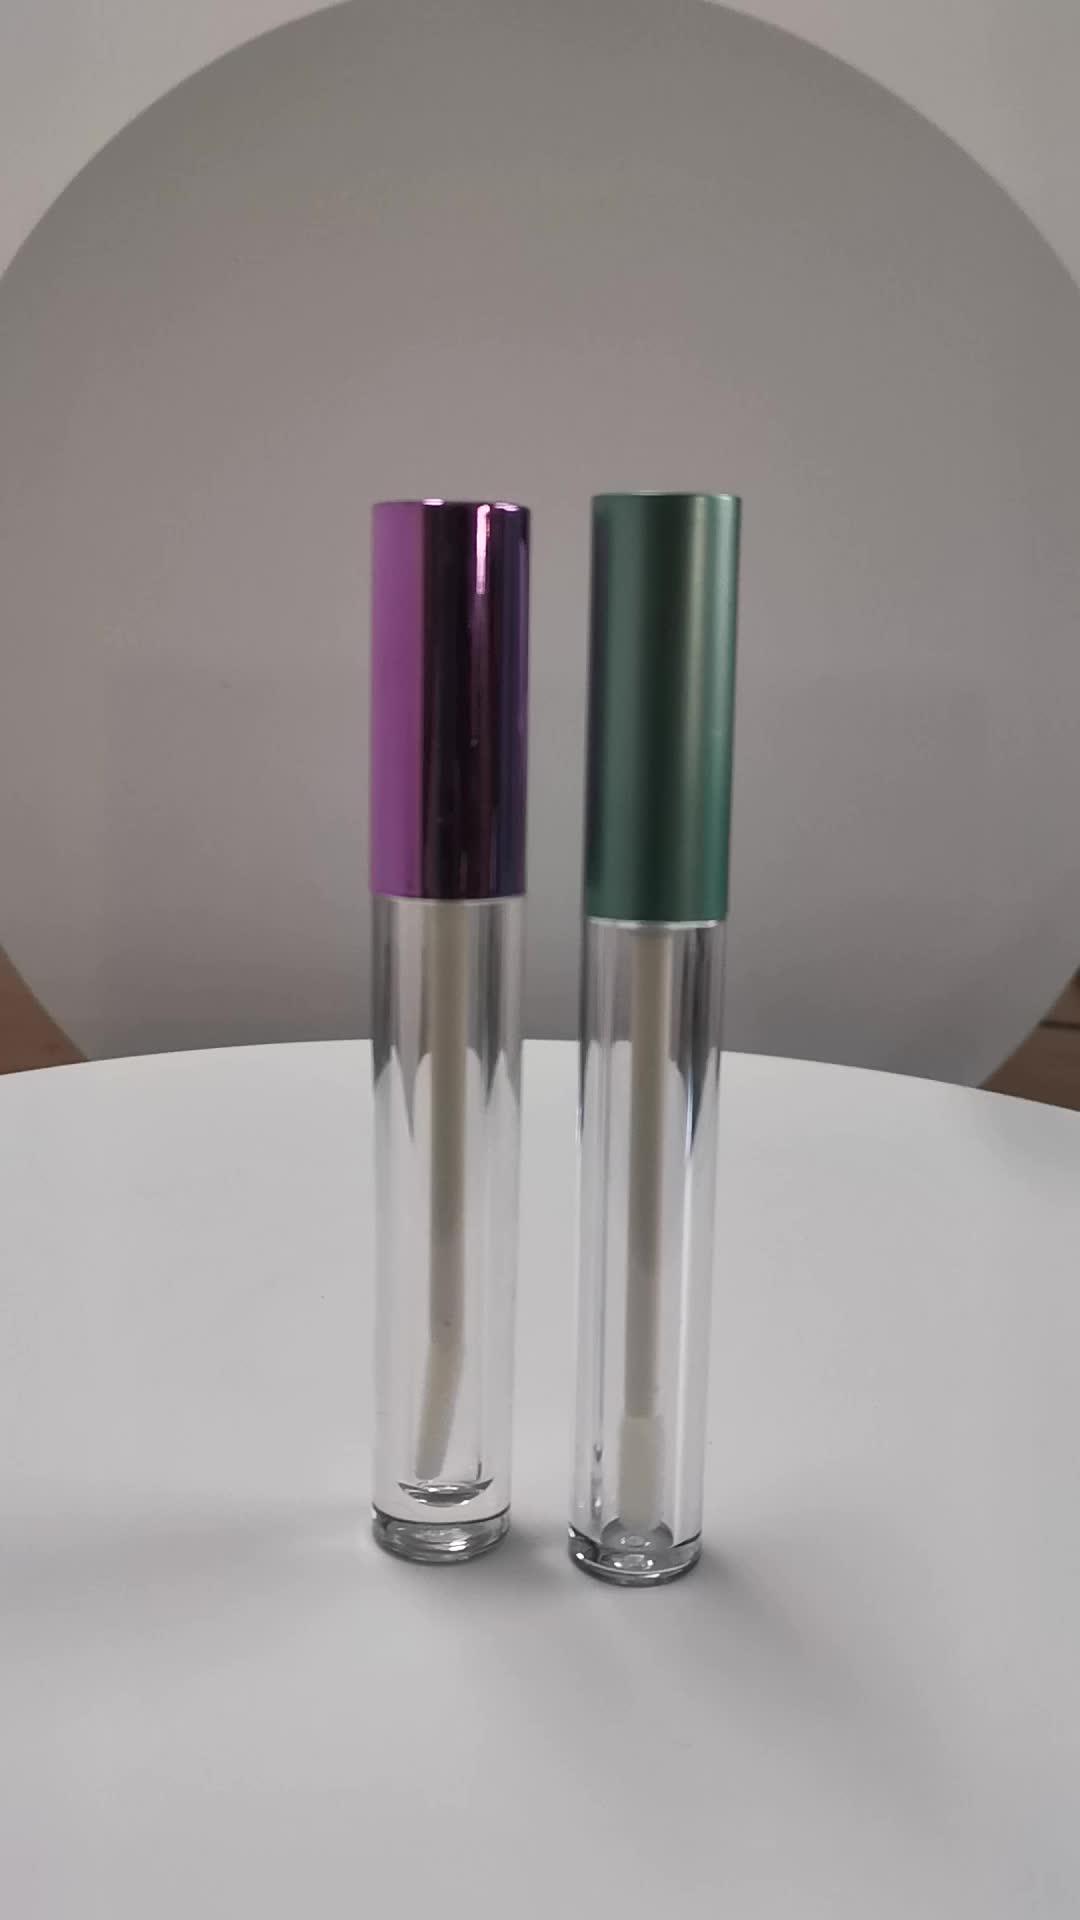 17*119mm ריק כמנהג גלוס צינור עם מברשת נוזל שפתון מיכל אריזה עם UV כובע